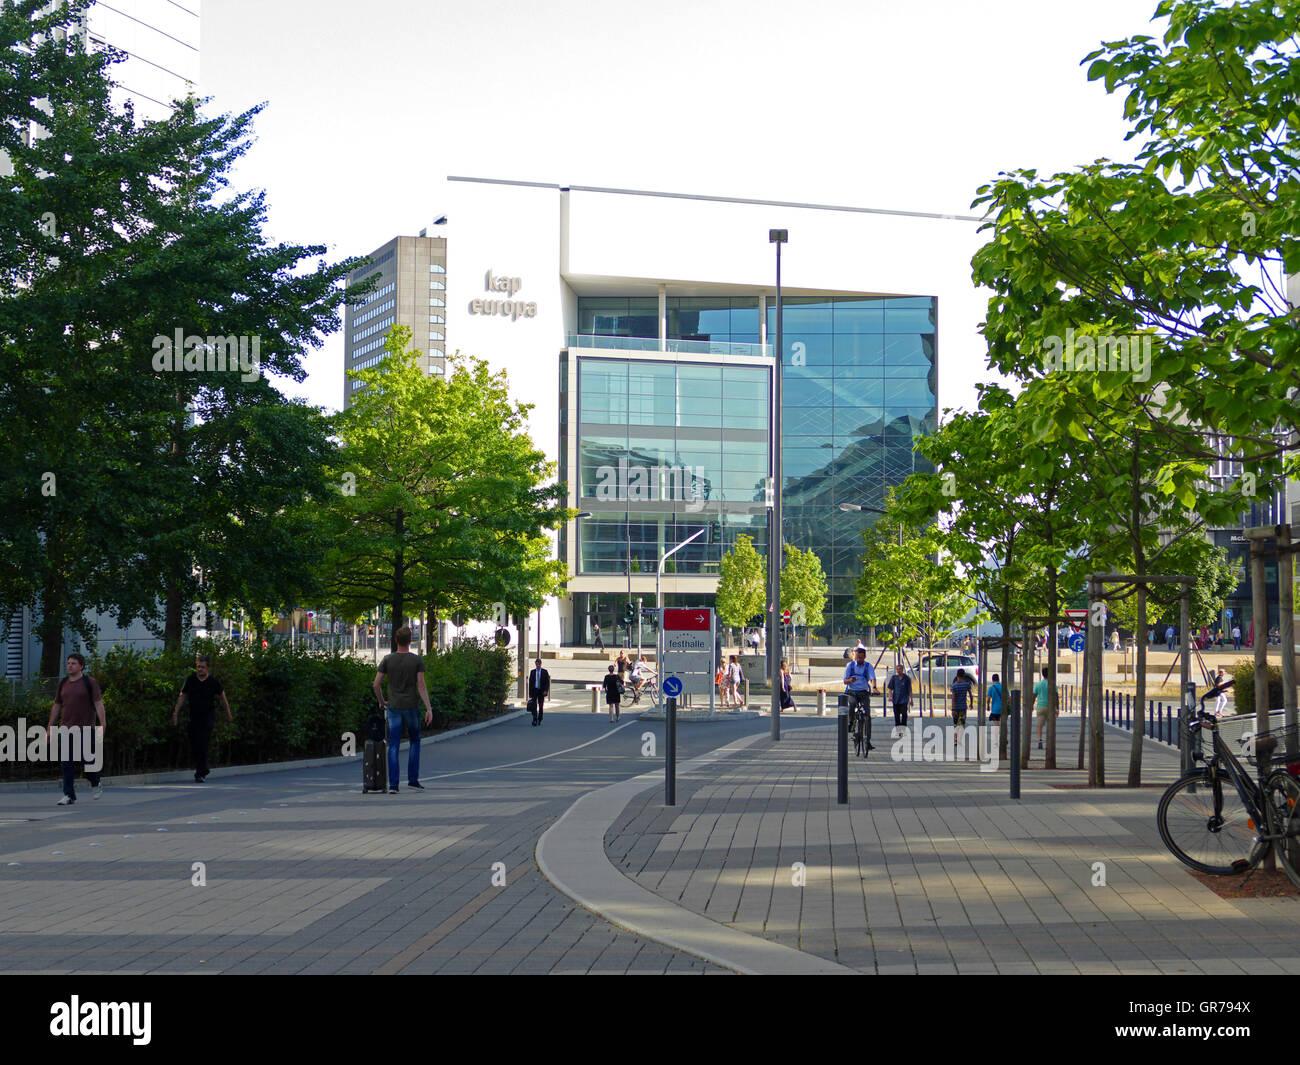 Kap Europa Congress center Frankfurt am Main Germany Europe - Stock Image